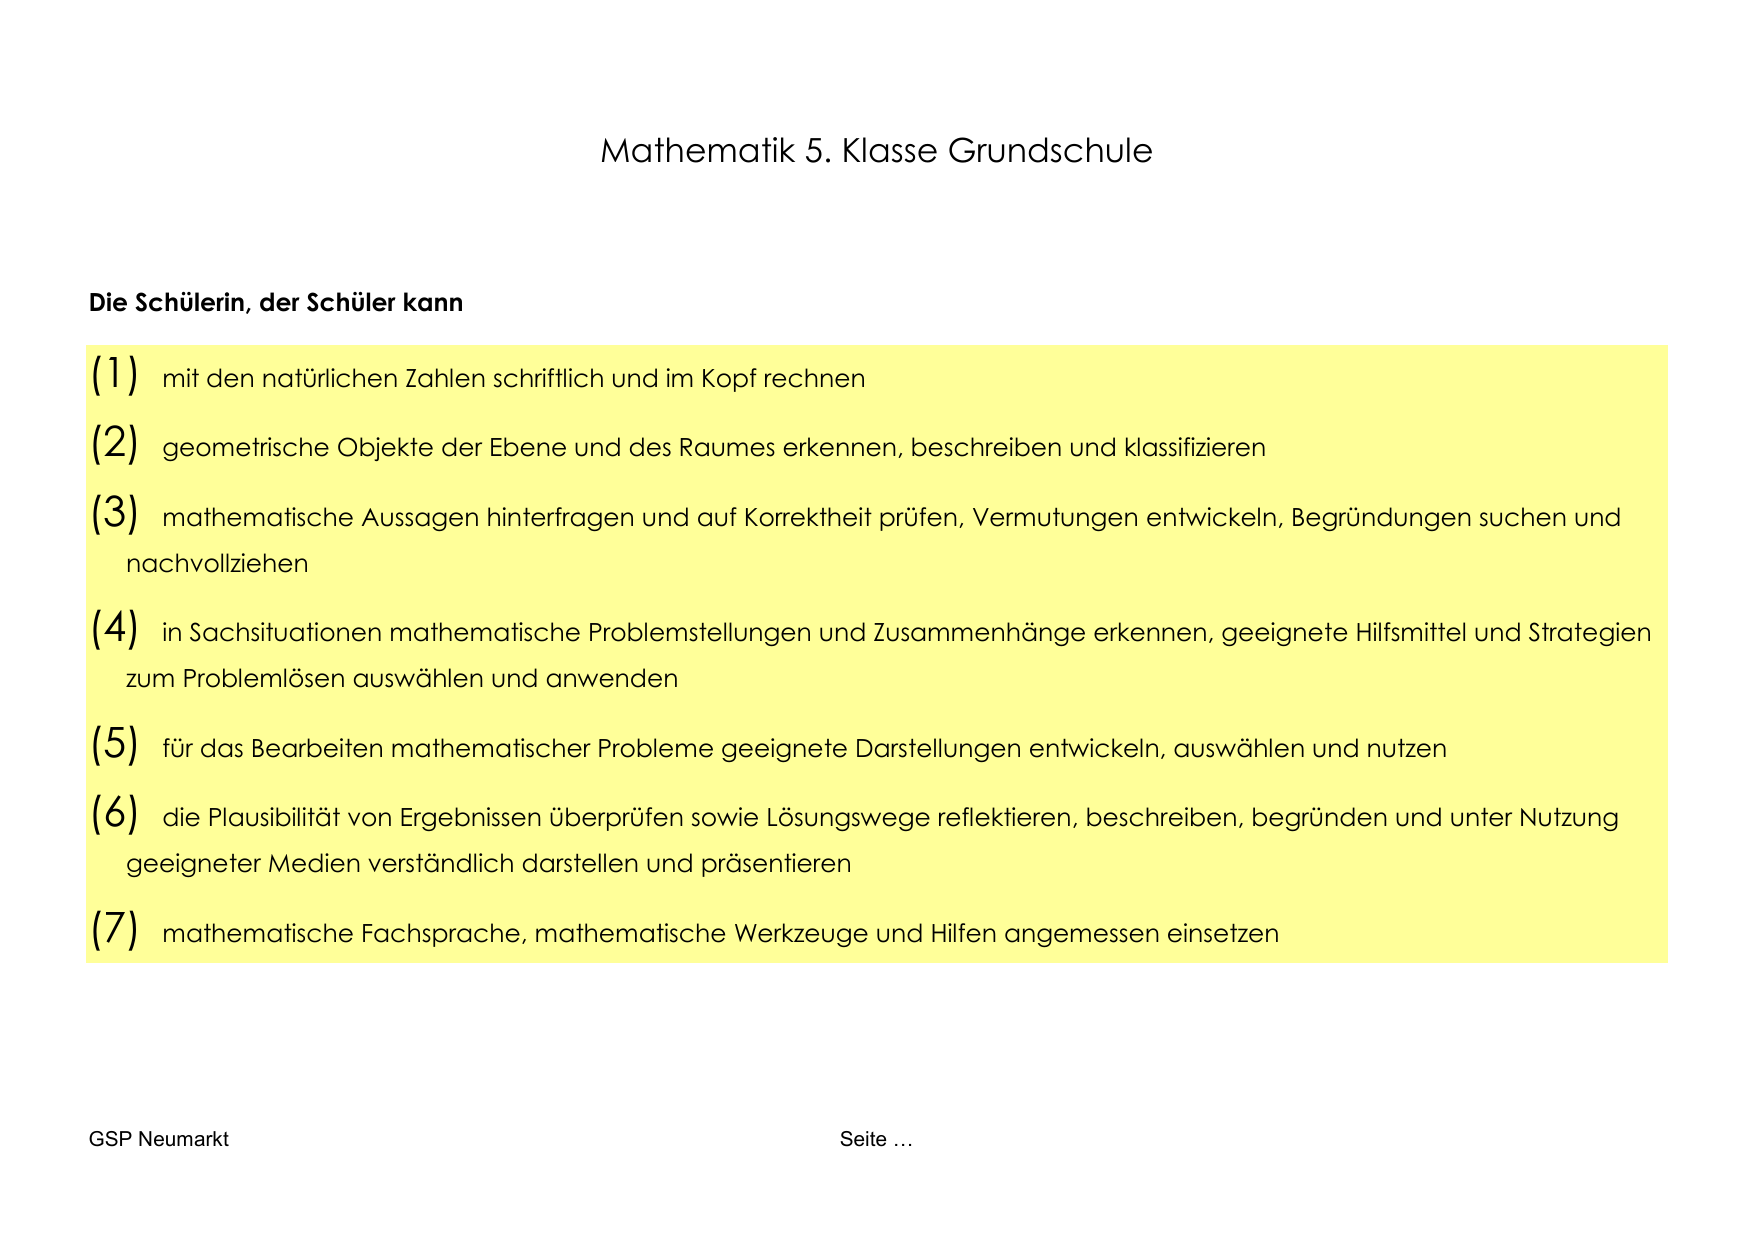 mathematik 5. Klasse GS - Grundschulsprengel Neumarkt